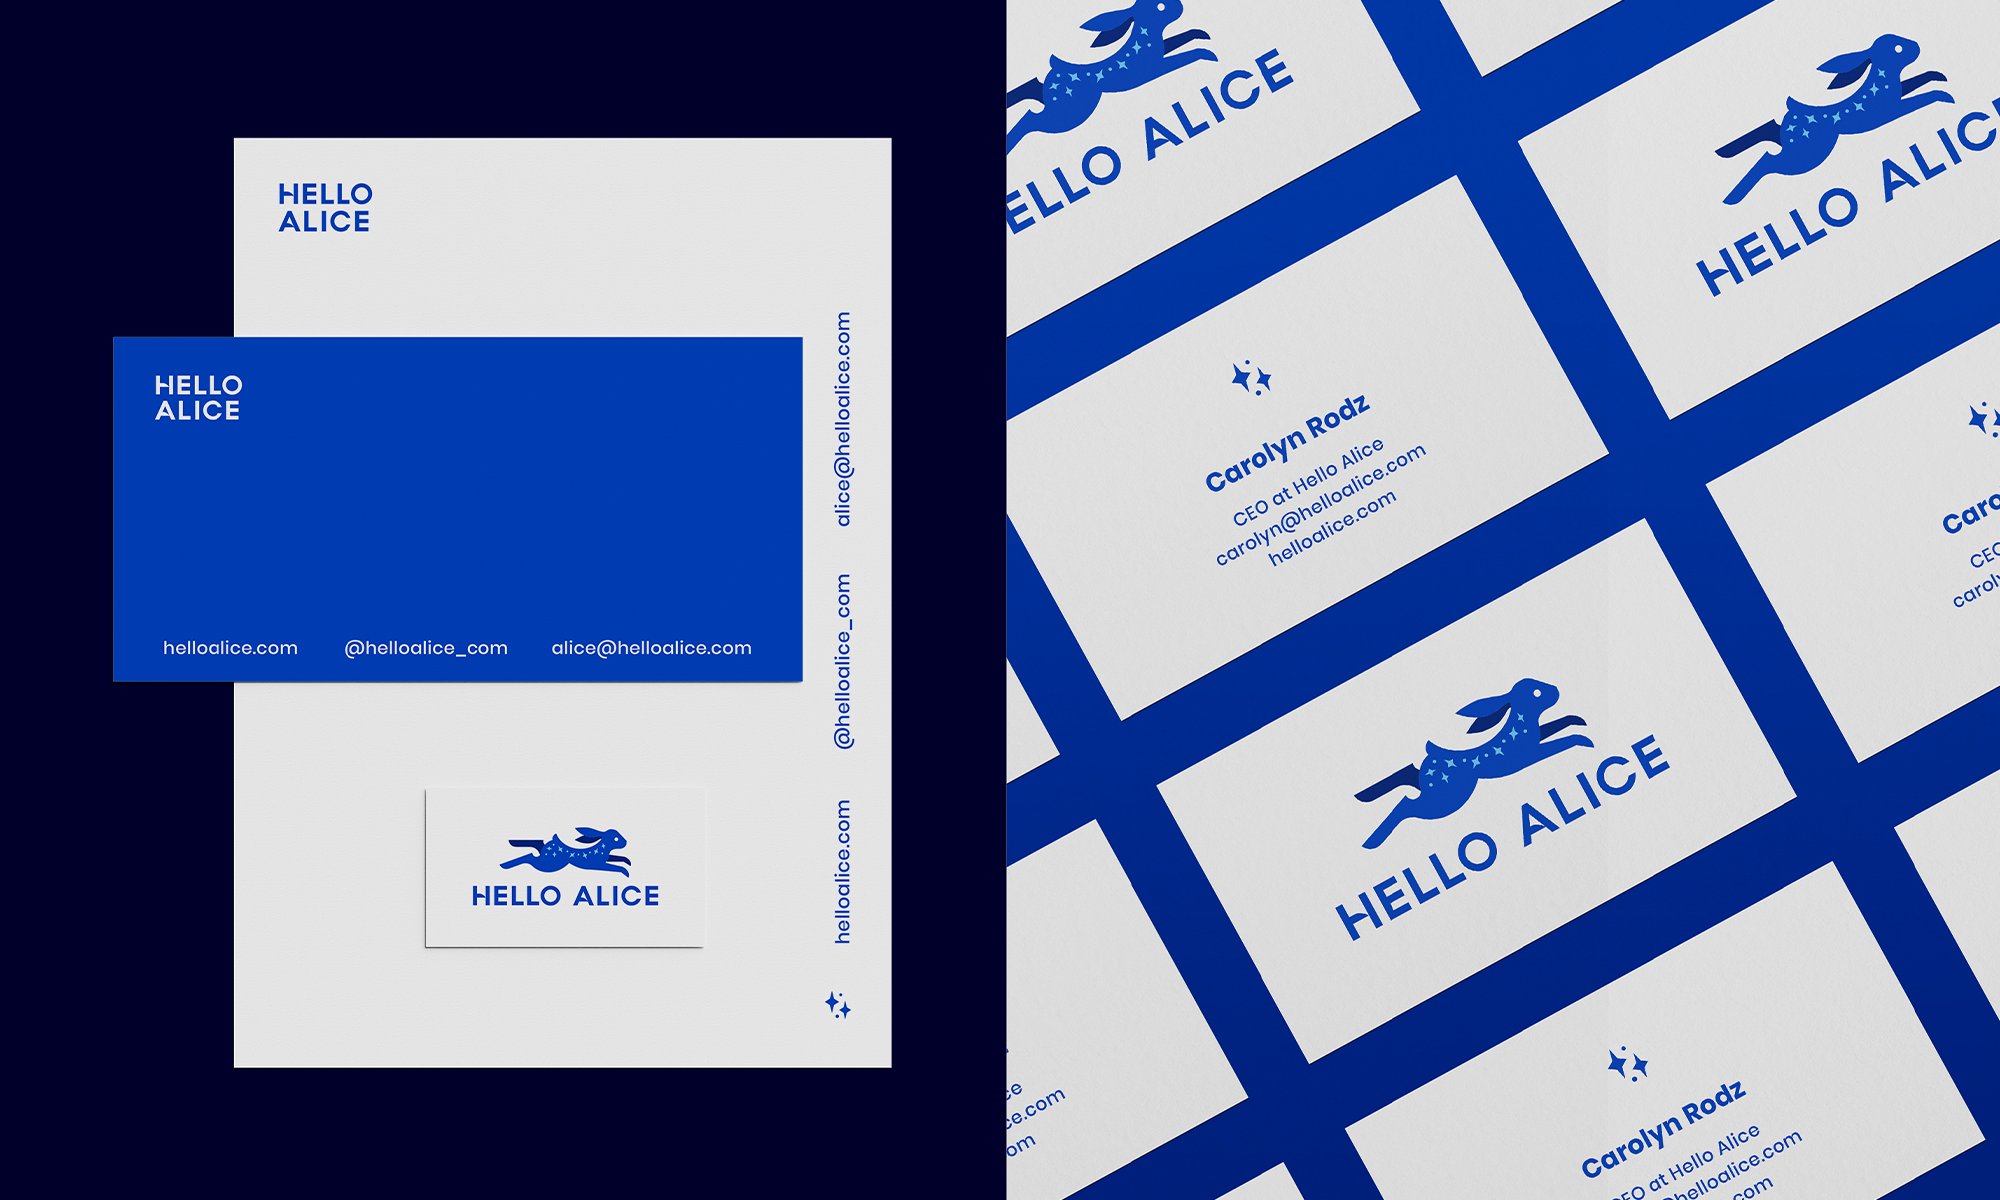 hello alice branding by motto